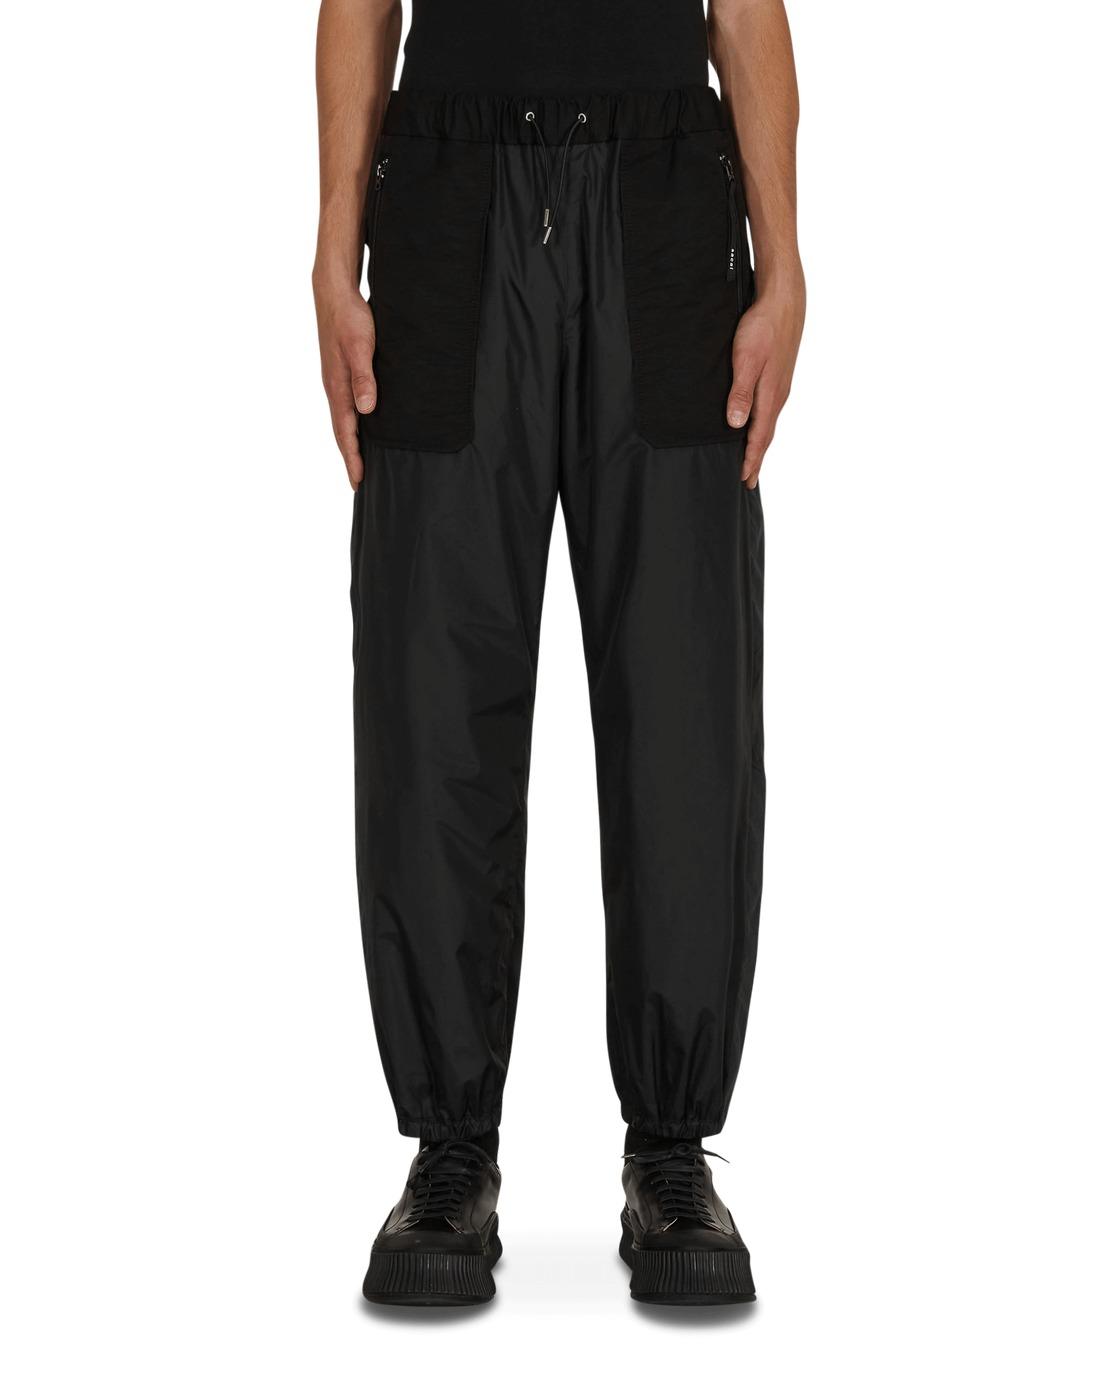 Sacai Nylon Trousers Black